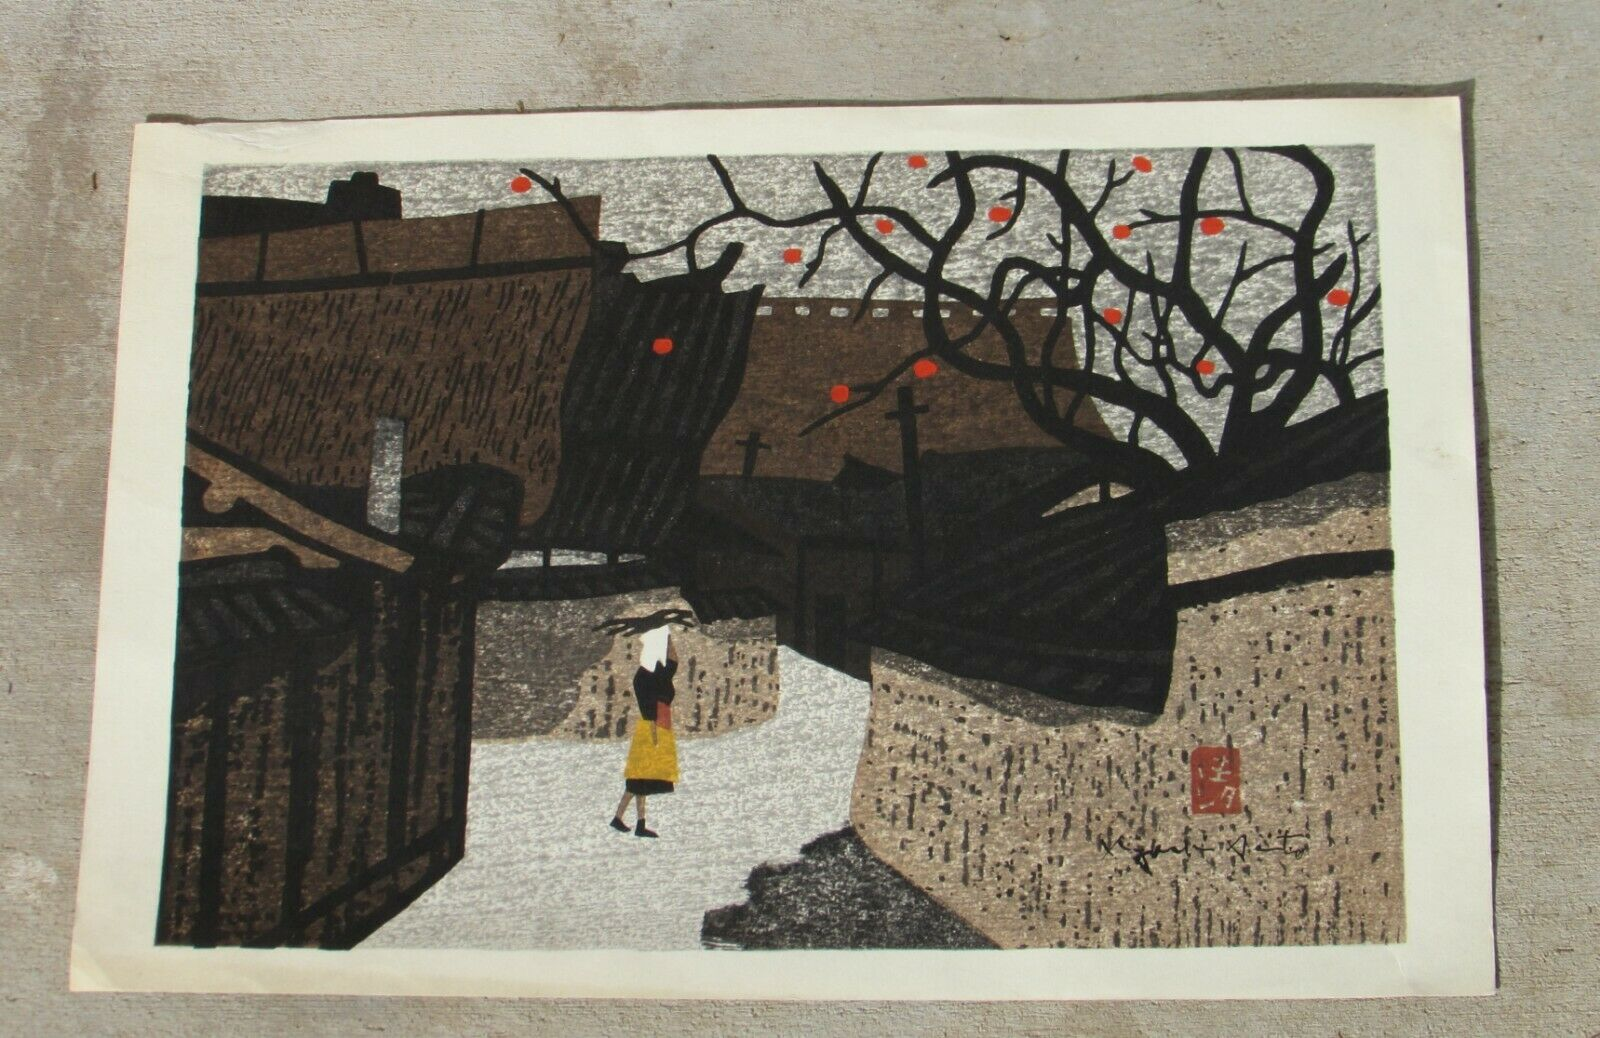 KIYOSHI SAITO Circa 1960's Woodblock Persimmon Lined Street Signed in the Plate on eBay thumbnail